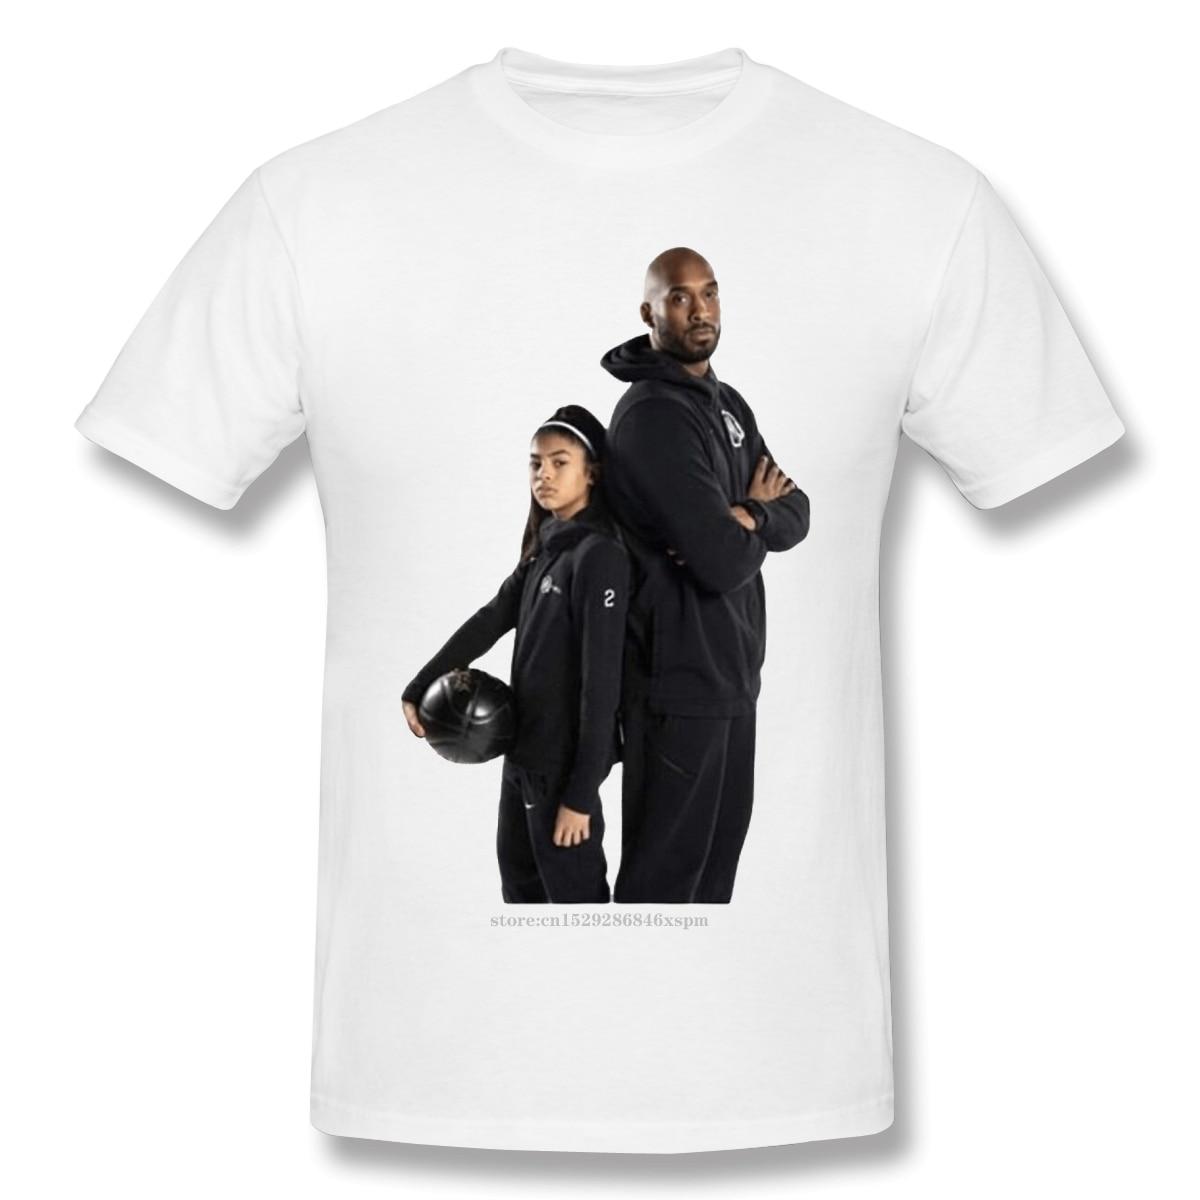 Men kobe bryant T-Shirts Funny Round Neck Short Sleeve Tops Kobe And Gigi Pure Cotton Tees Funny Harajuku tShirt